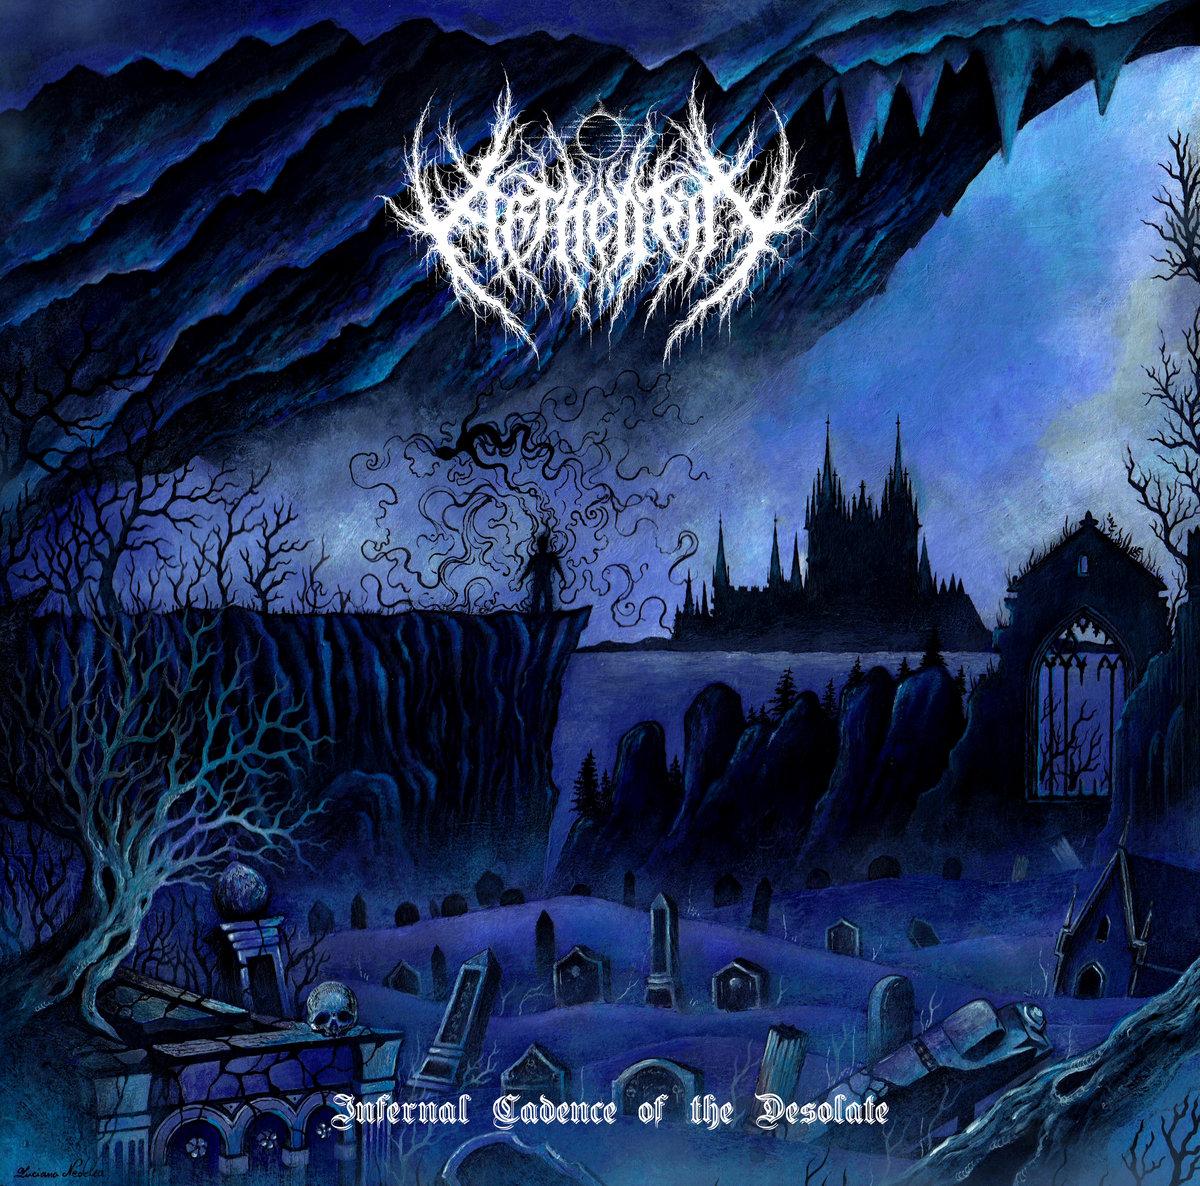 Arthedain - Infernal Cadence Of The Desolate